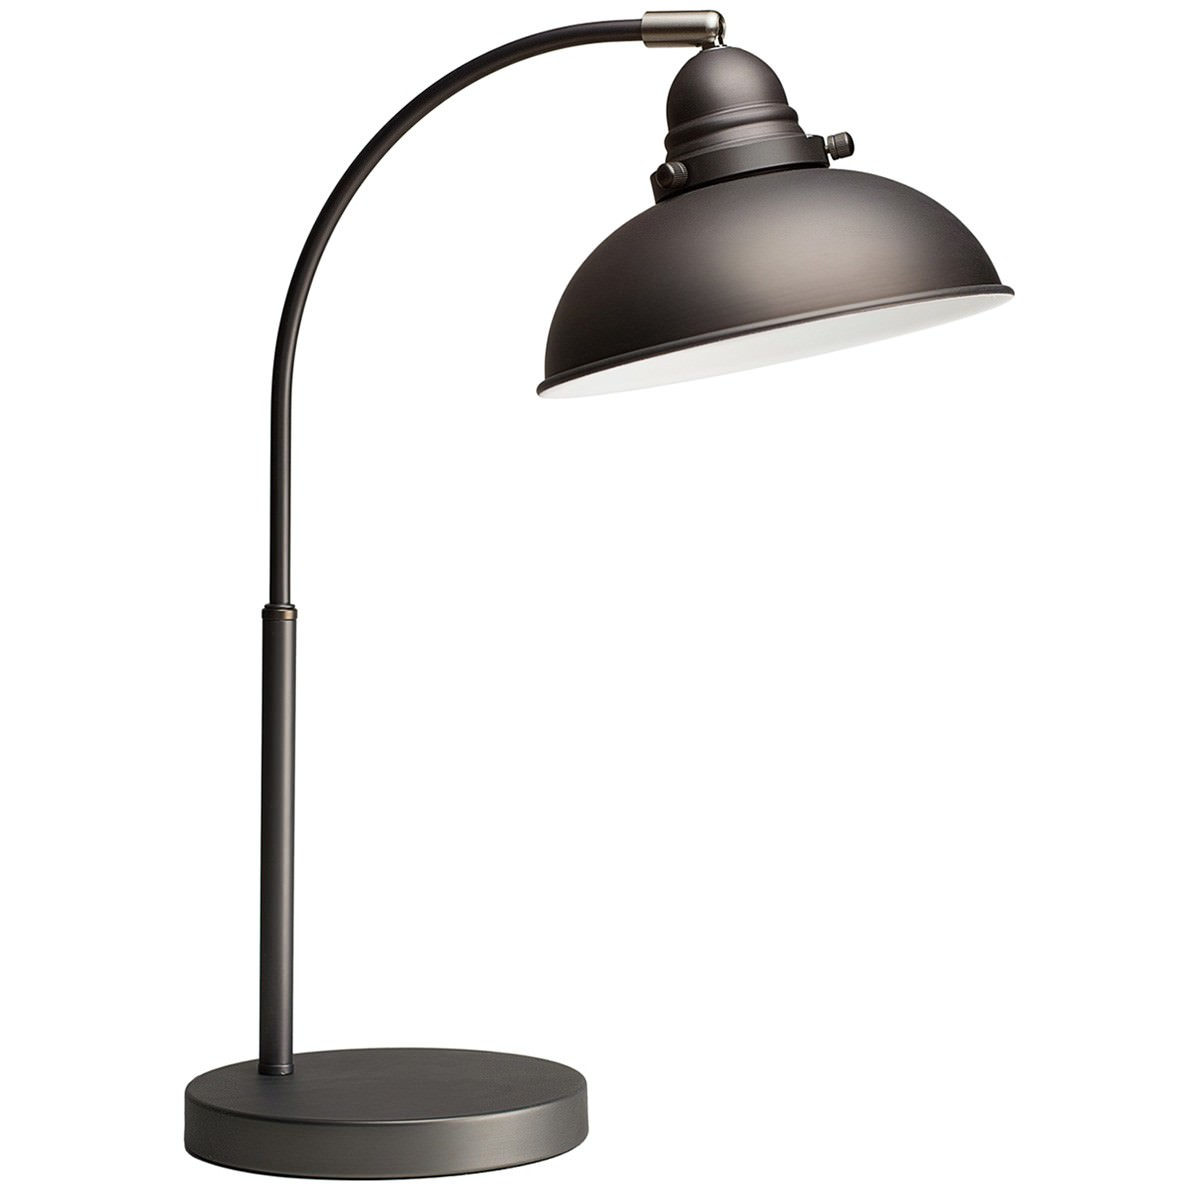 Manor Metal Desk Lamp, Antique Chrome